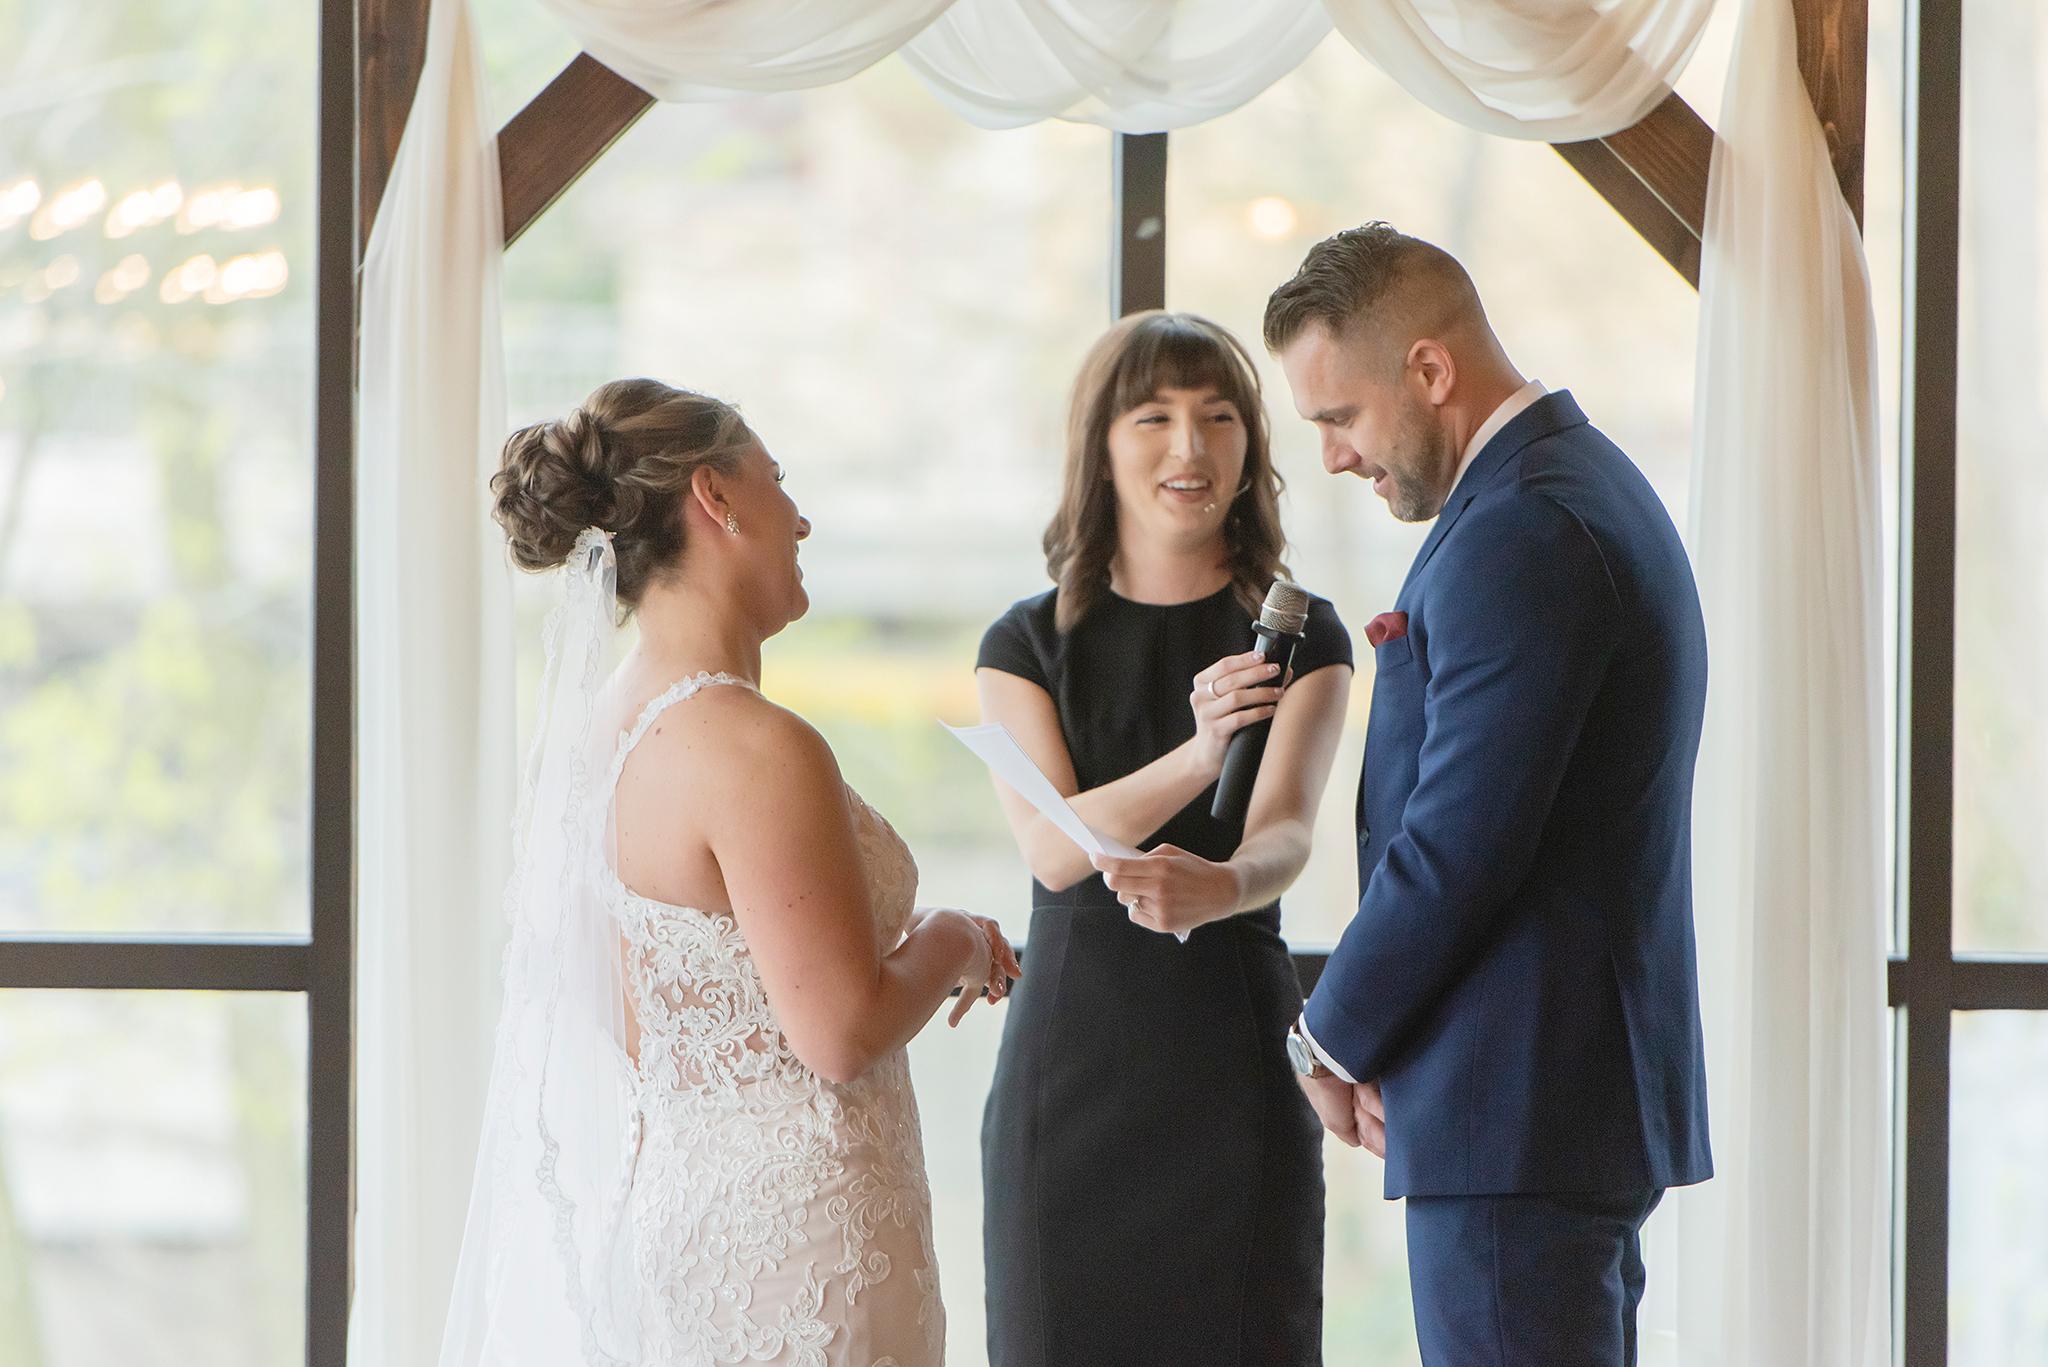 LINDSAY-ADKINS-PHOTOGRAPHY-MICHIGAN-WEDDING-PHOTOGRAPHER-FRANKENMUTH-BREWERY-WEDDING-MICHIGAN-BLOG-22